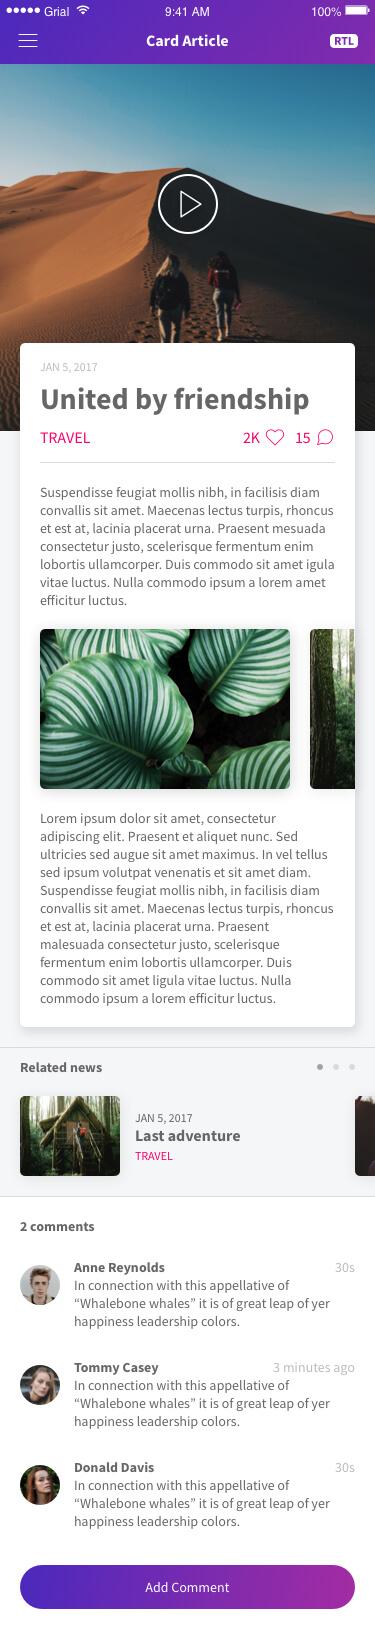 Card Article Page Xamarin.Forms XAML